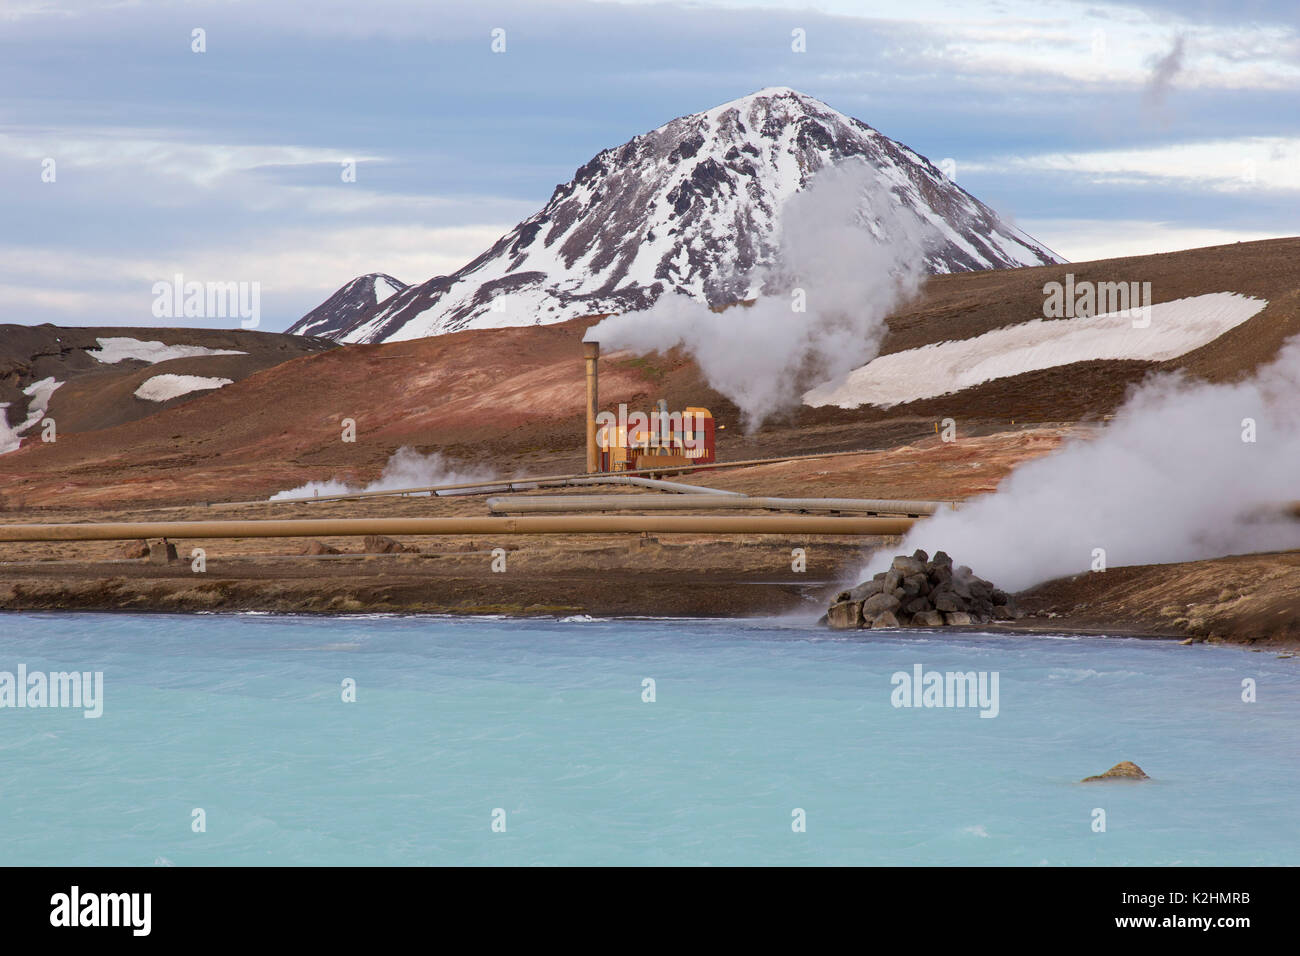 Bjarnarflag Geothermal power station / Bjarnarflagsvirkjun, exploité par Landsvirkjun près de Námafjall Mountain dans la zone géothermique de Mývatn, Islande Photo Stock